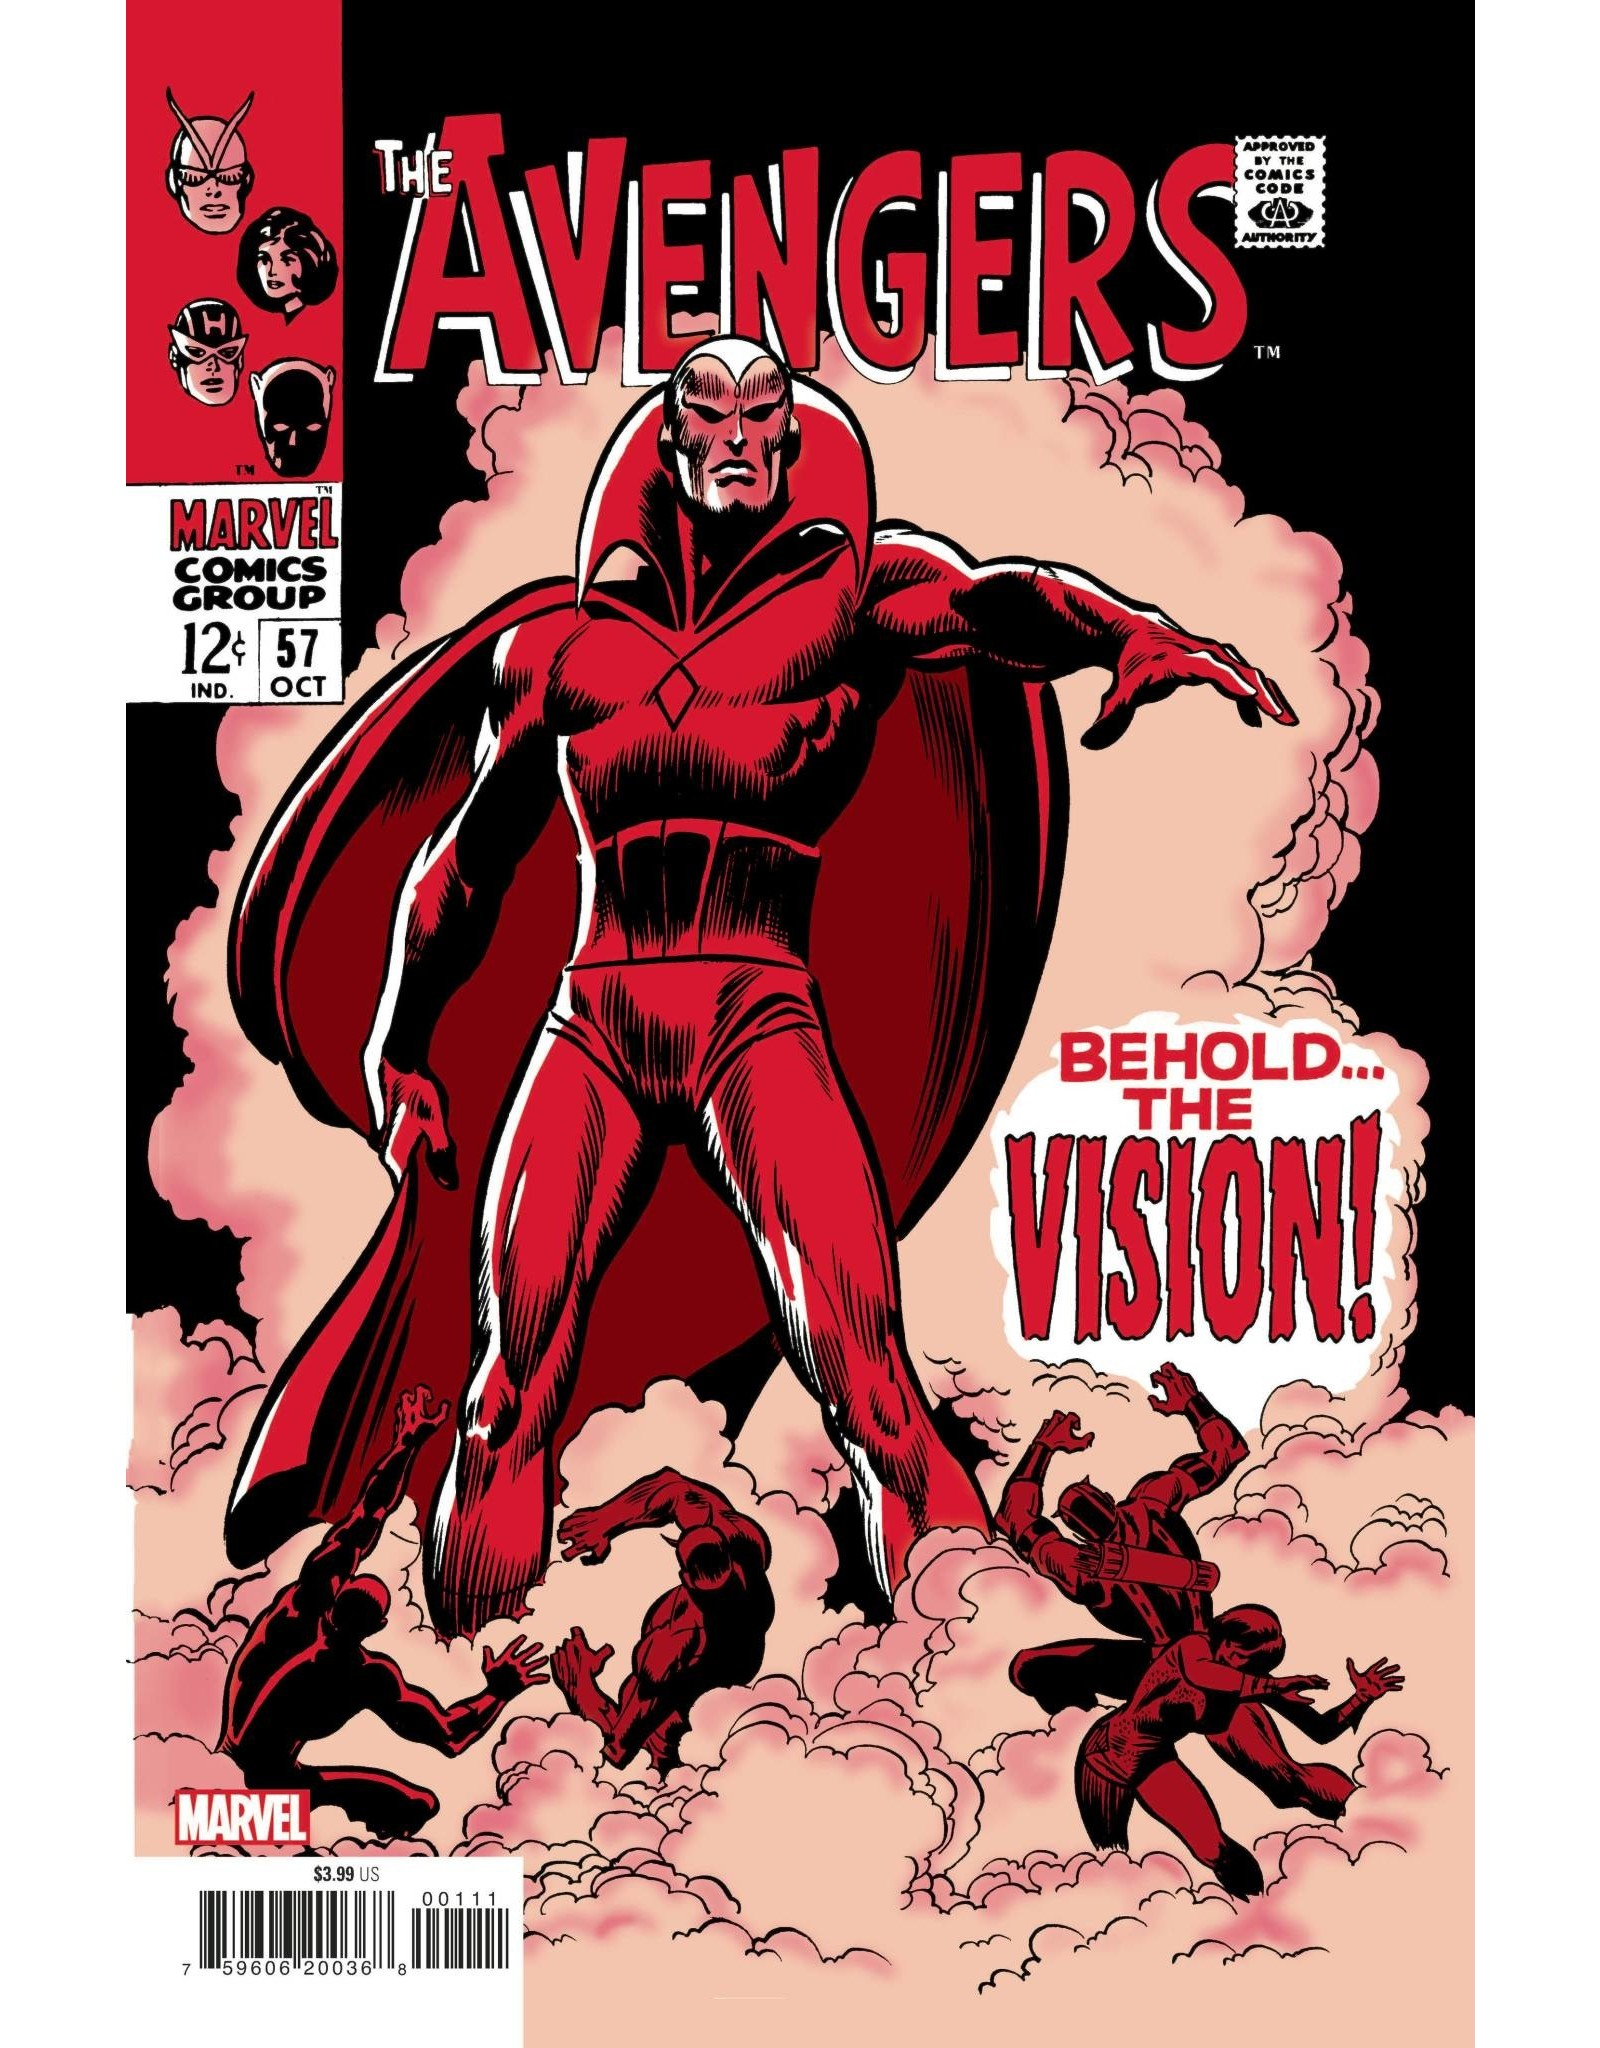 Marvel Comics AVENGERS #57 FACSIMILE EDITION